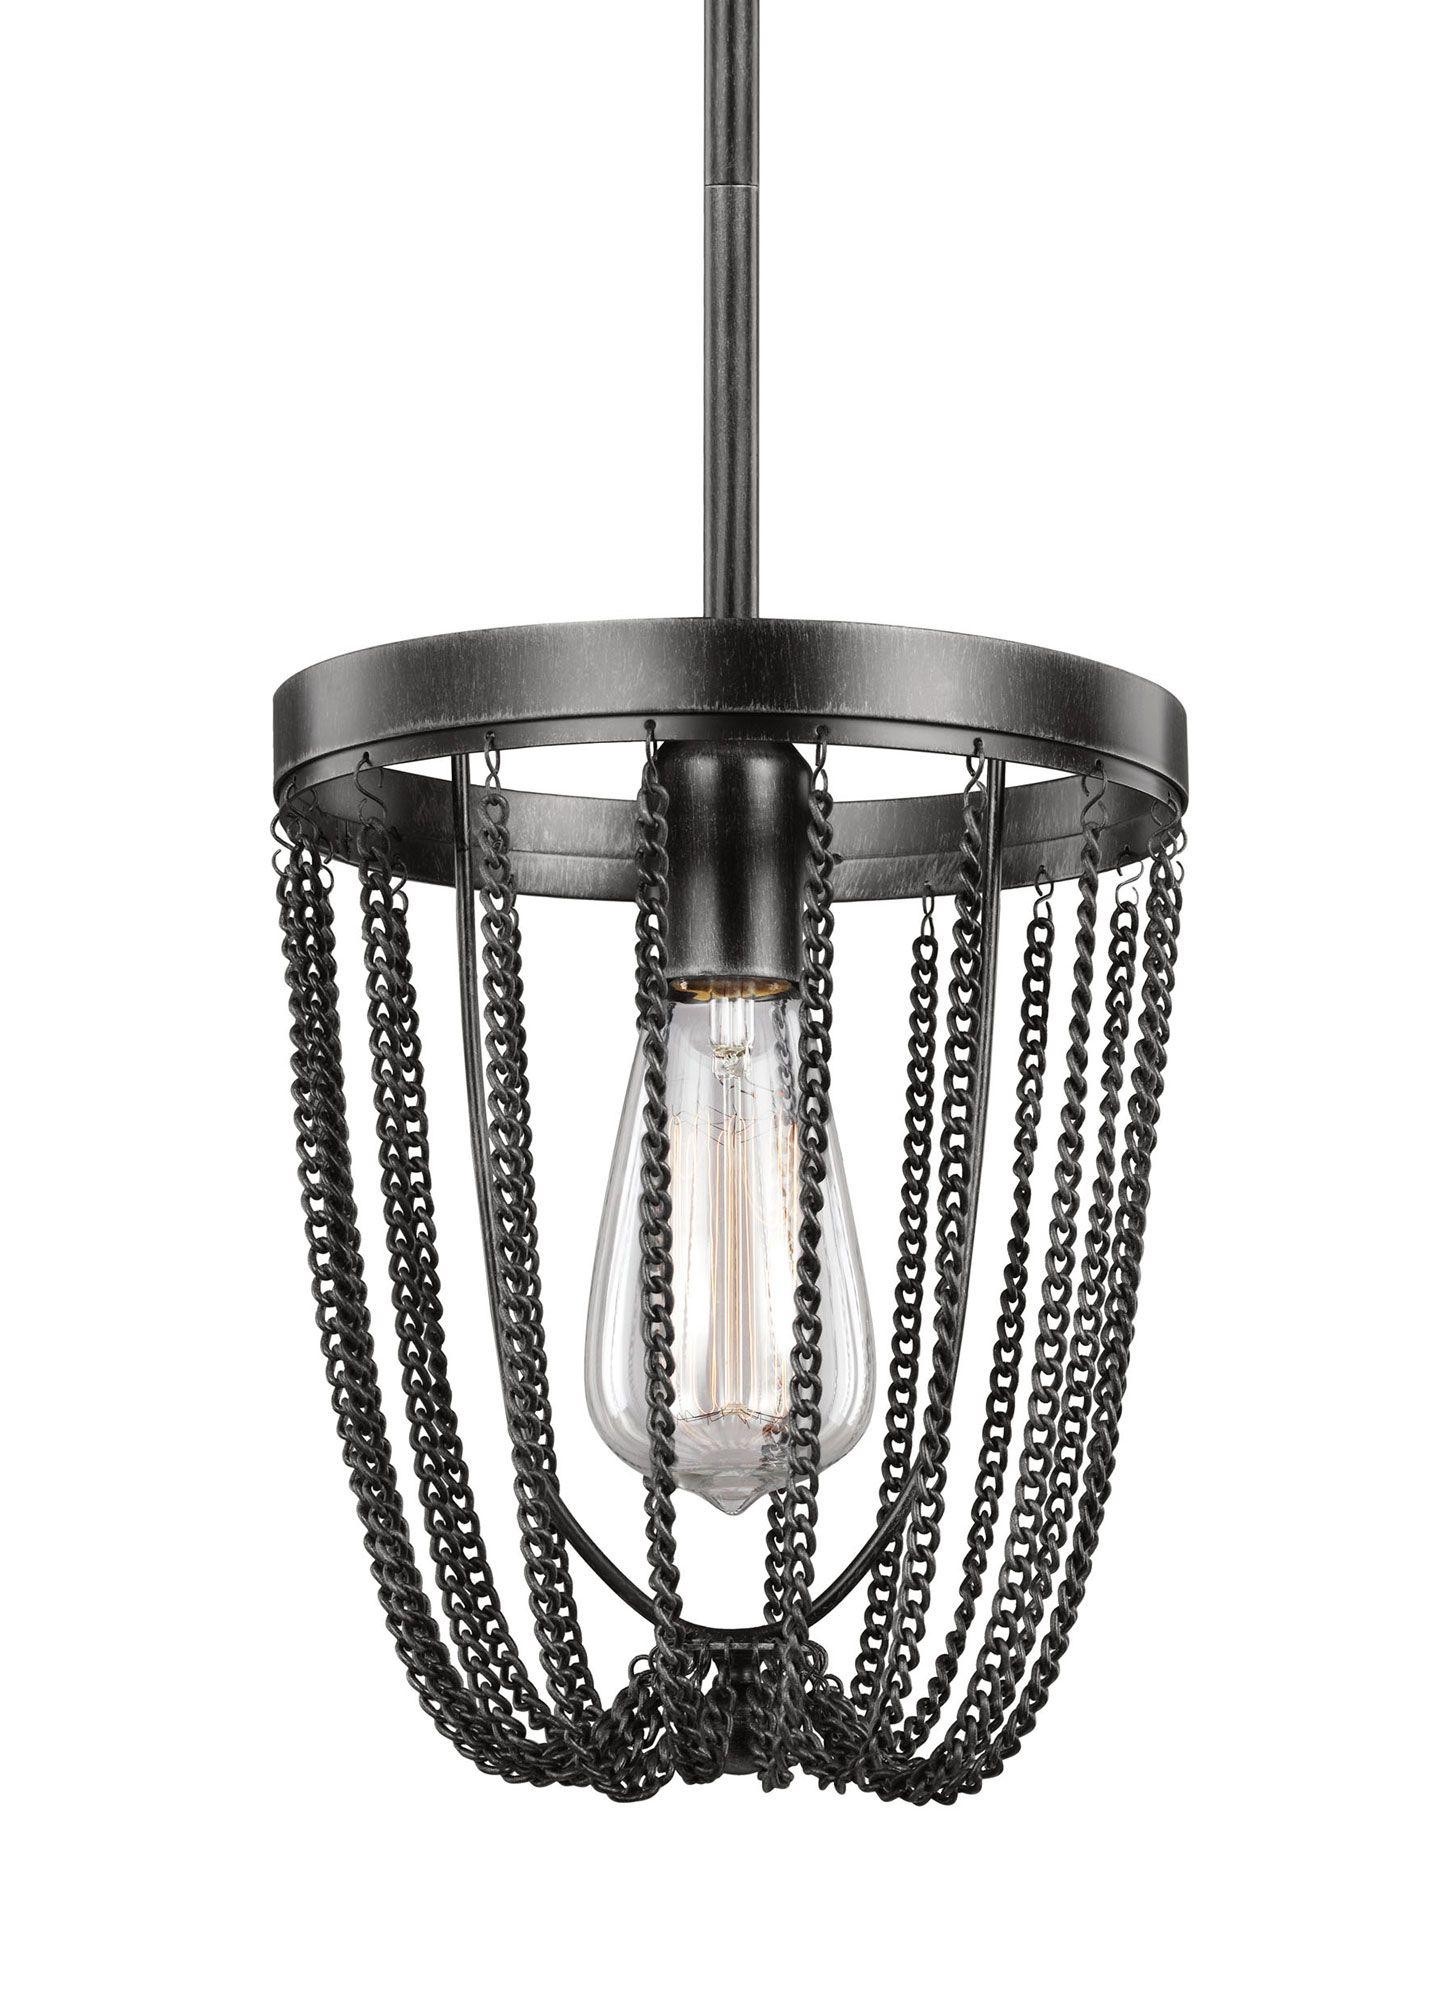 Kelvyn park mini pendant incandescent bulbs mini pendant and bulbs